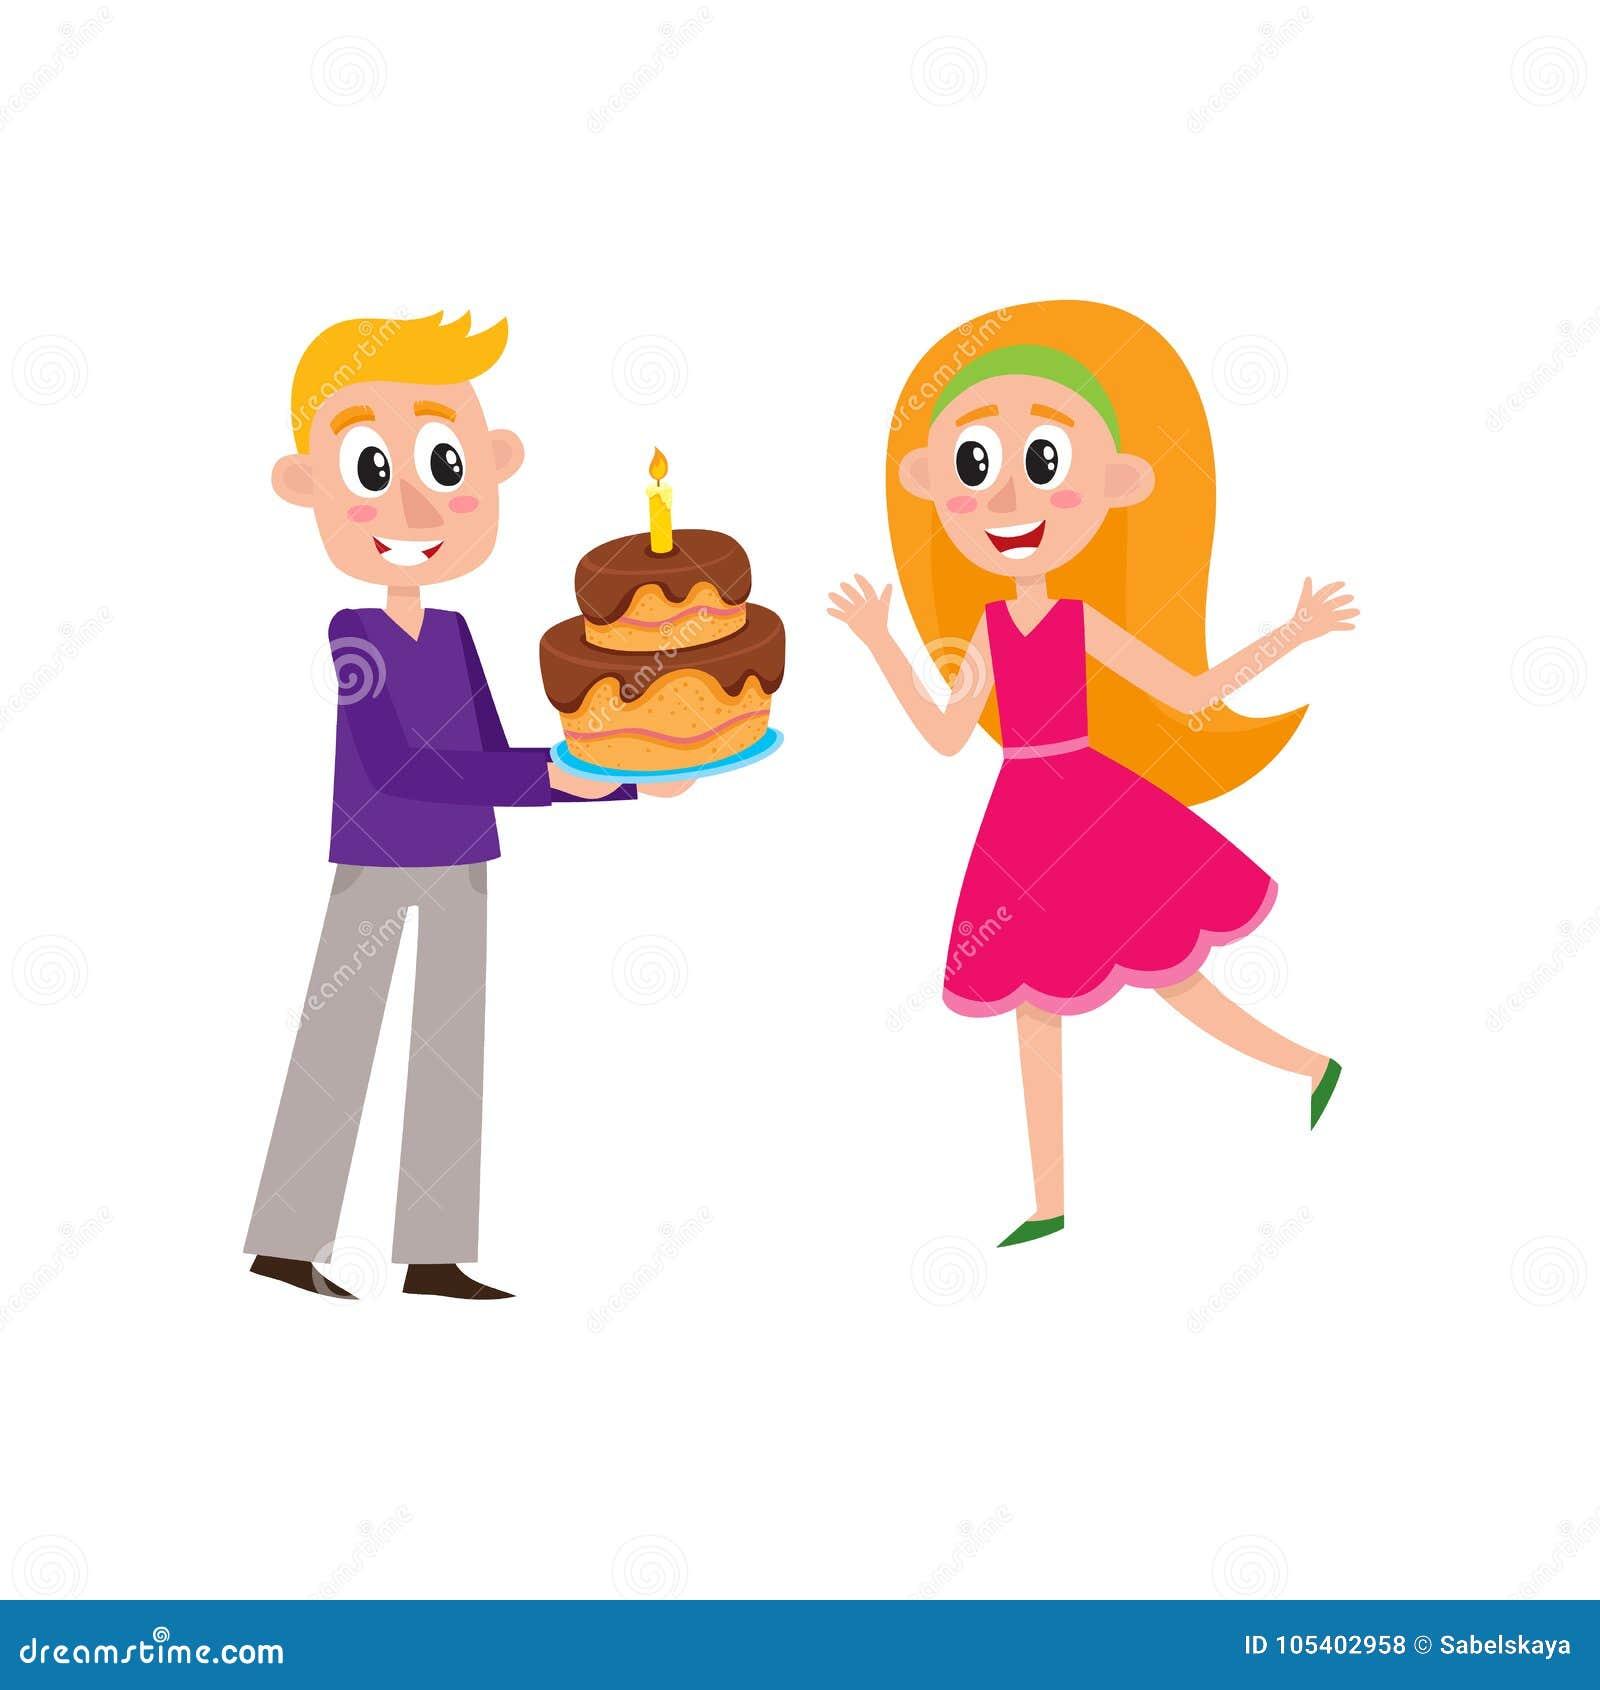 Download Διανυσματικός επίπεδος άνδρας που δίνει το κέικ γενεθλίων στη γυναίκα Διανυσματική απεικόνιση - εικονογραφία από χαρακτήρας, διακοπές: 105402958